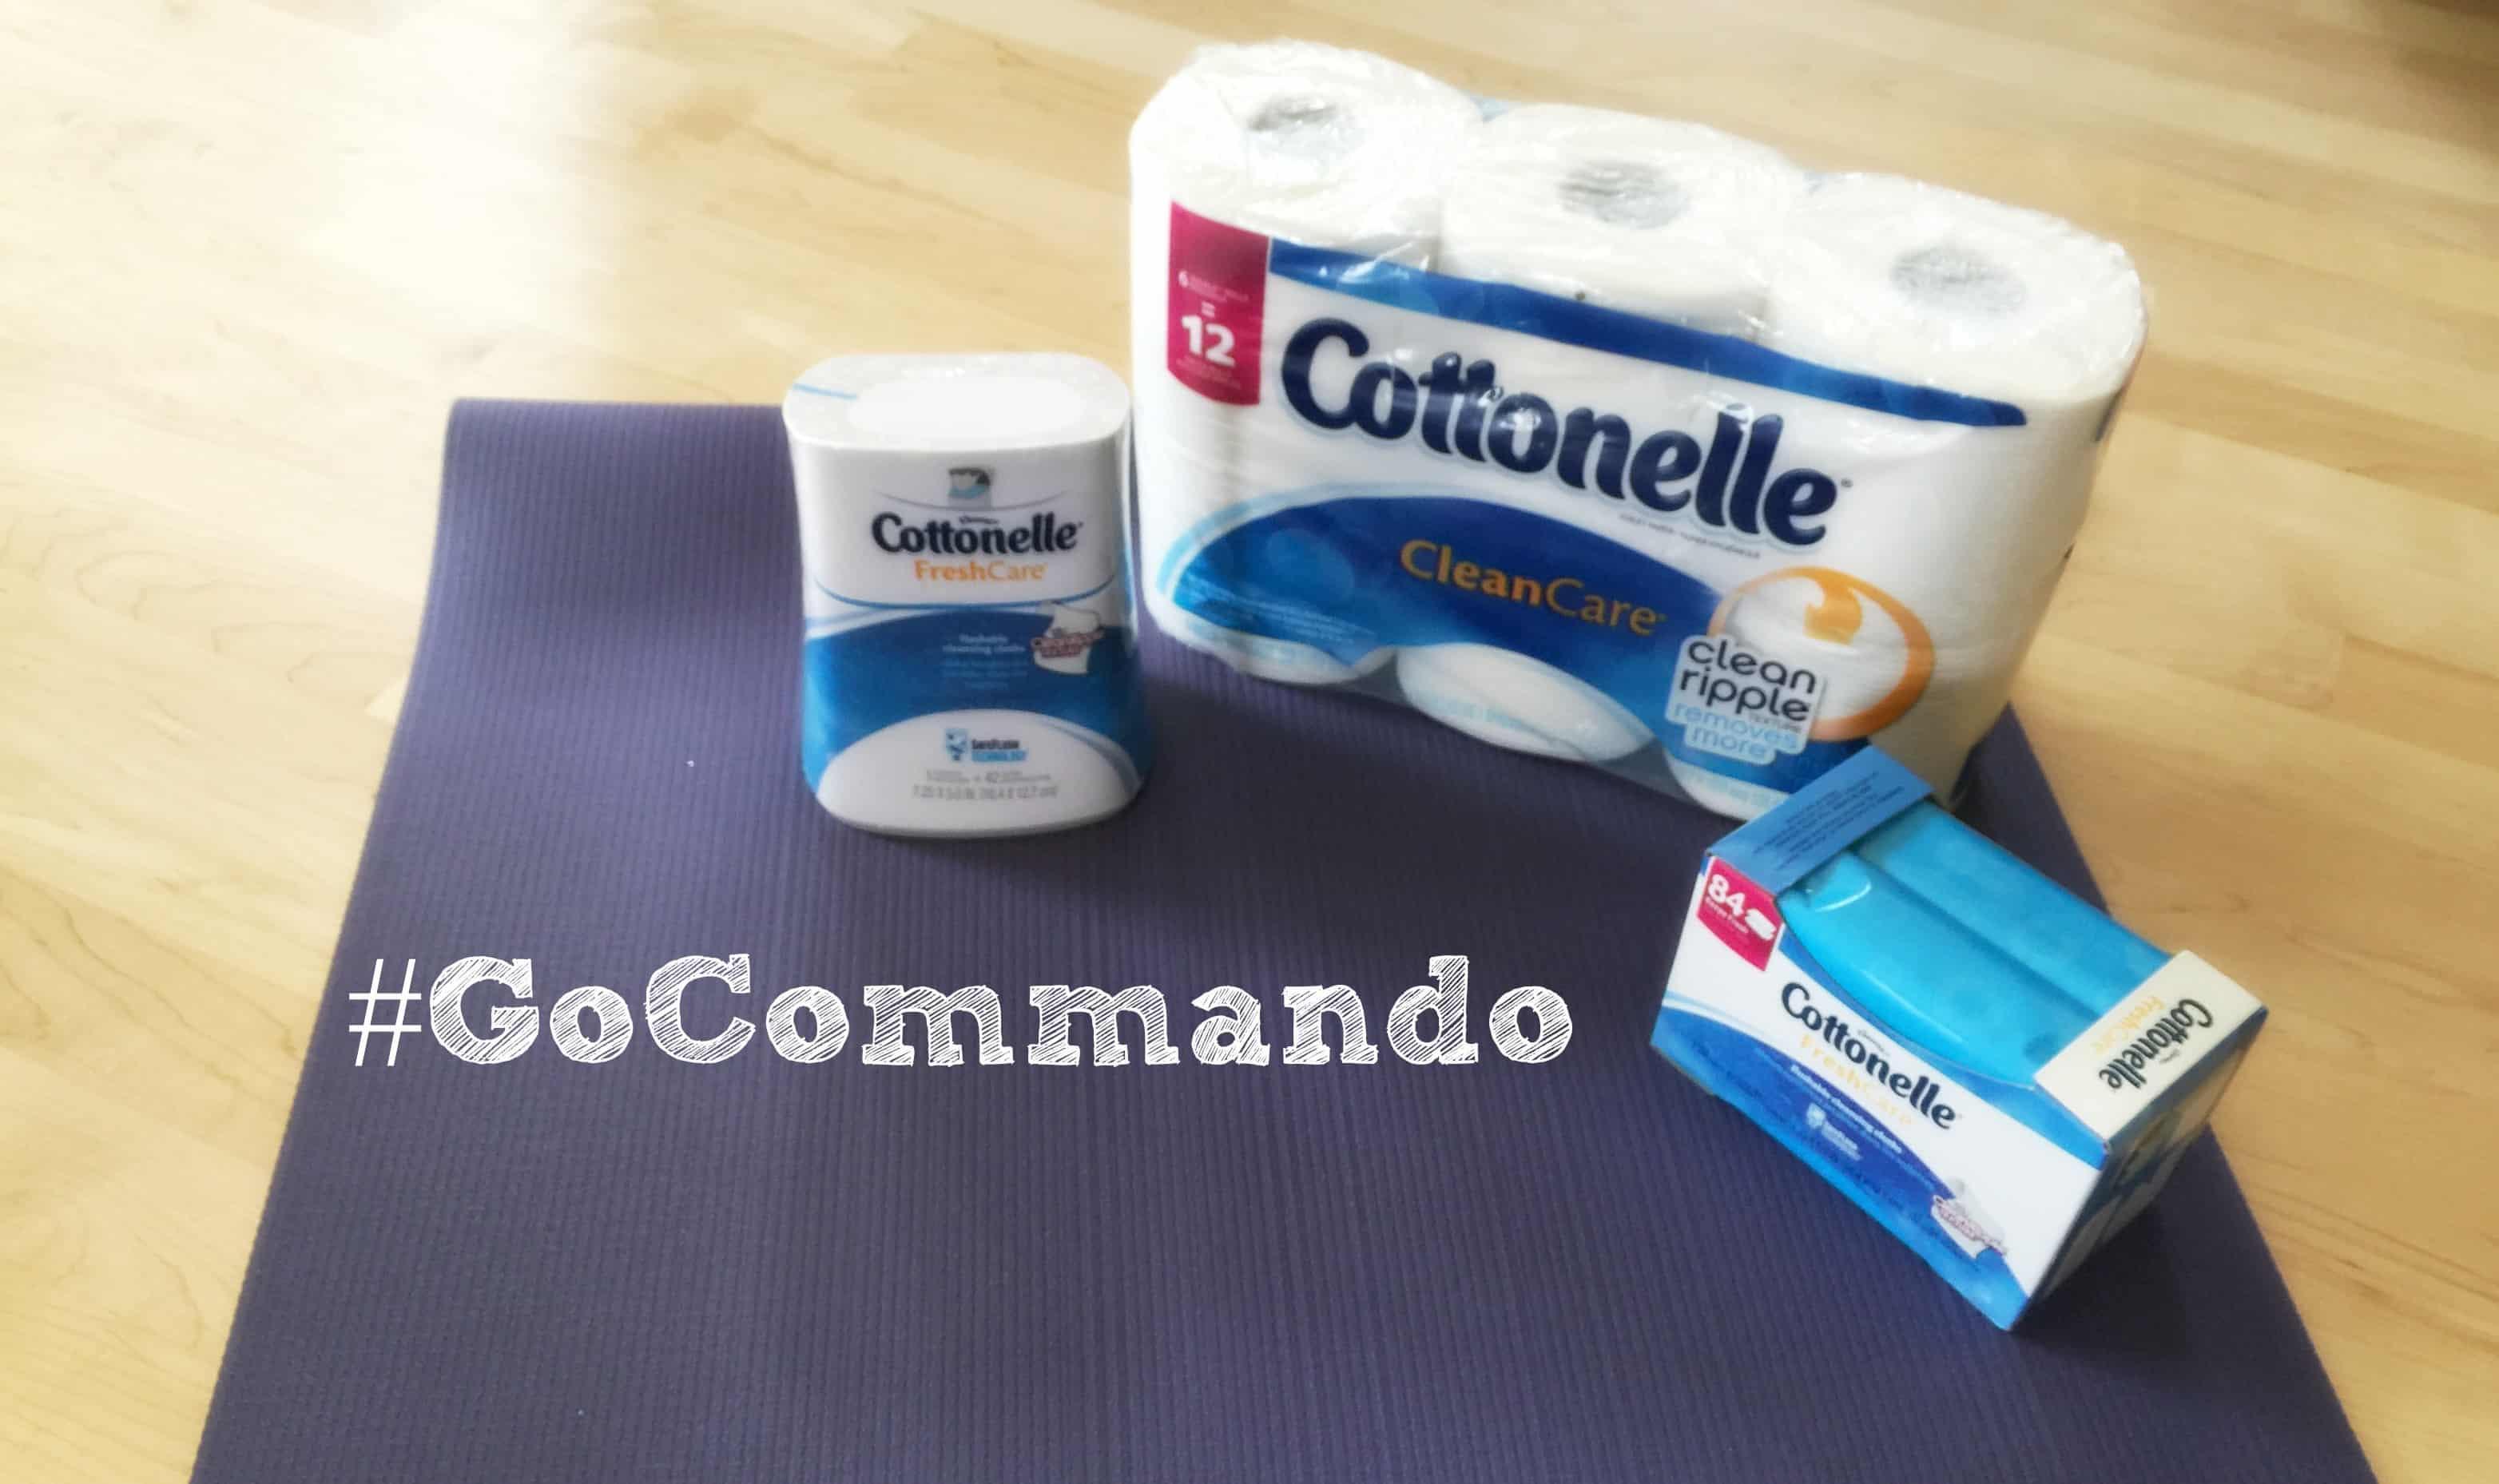 go_commando